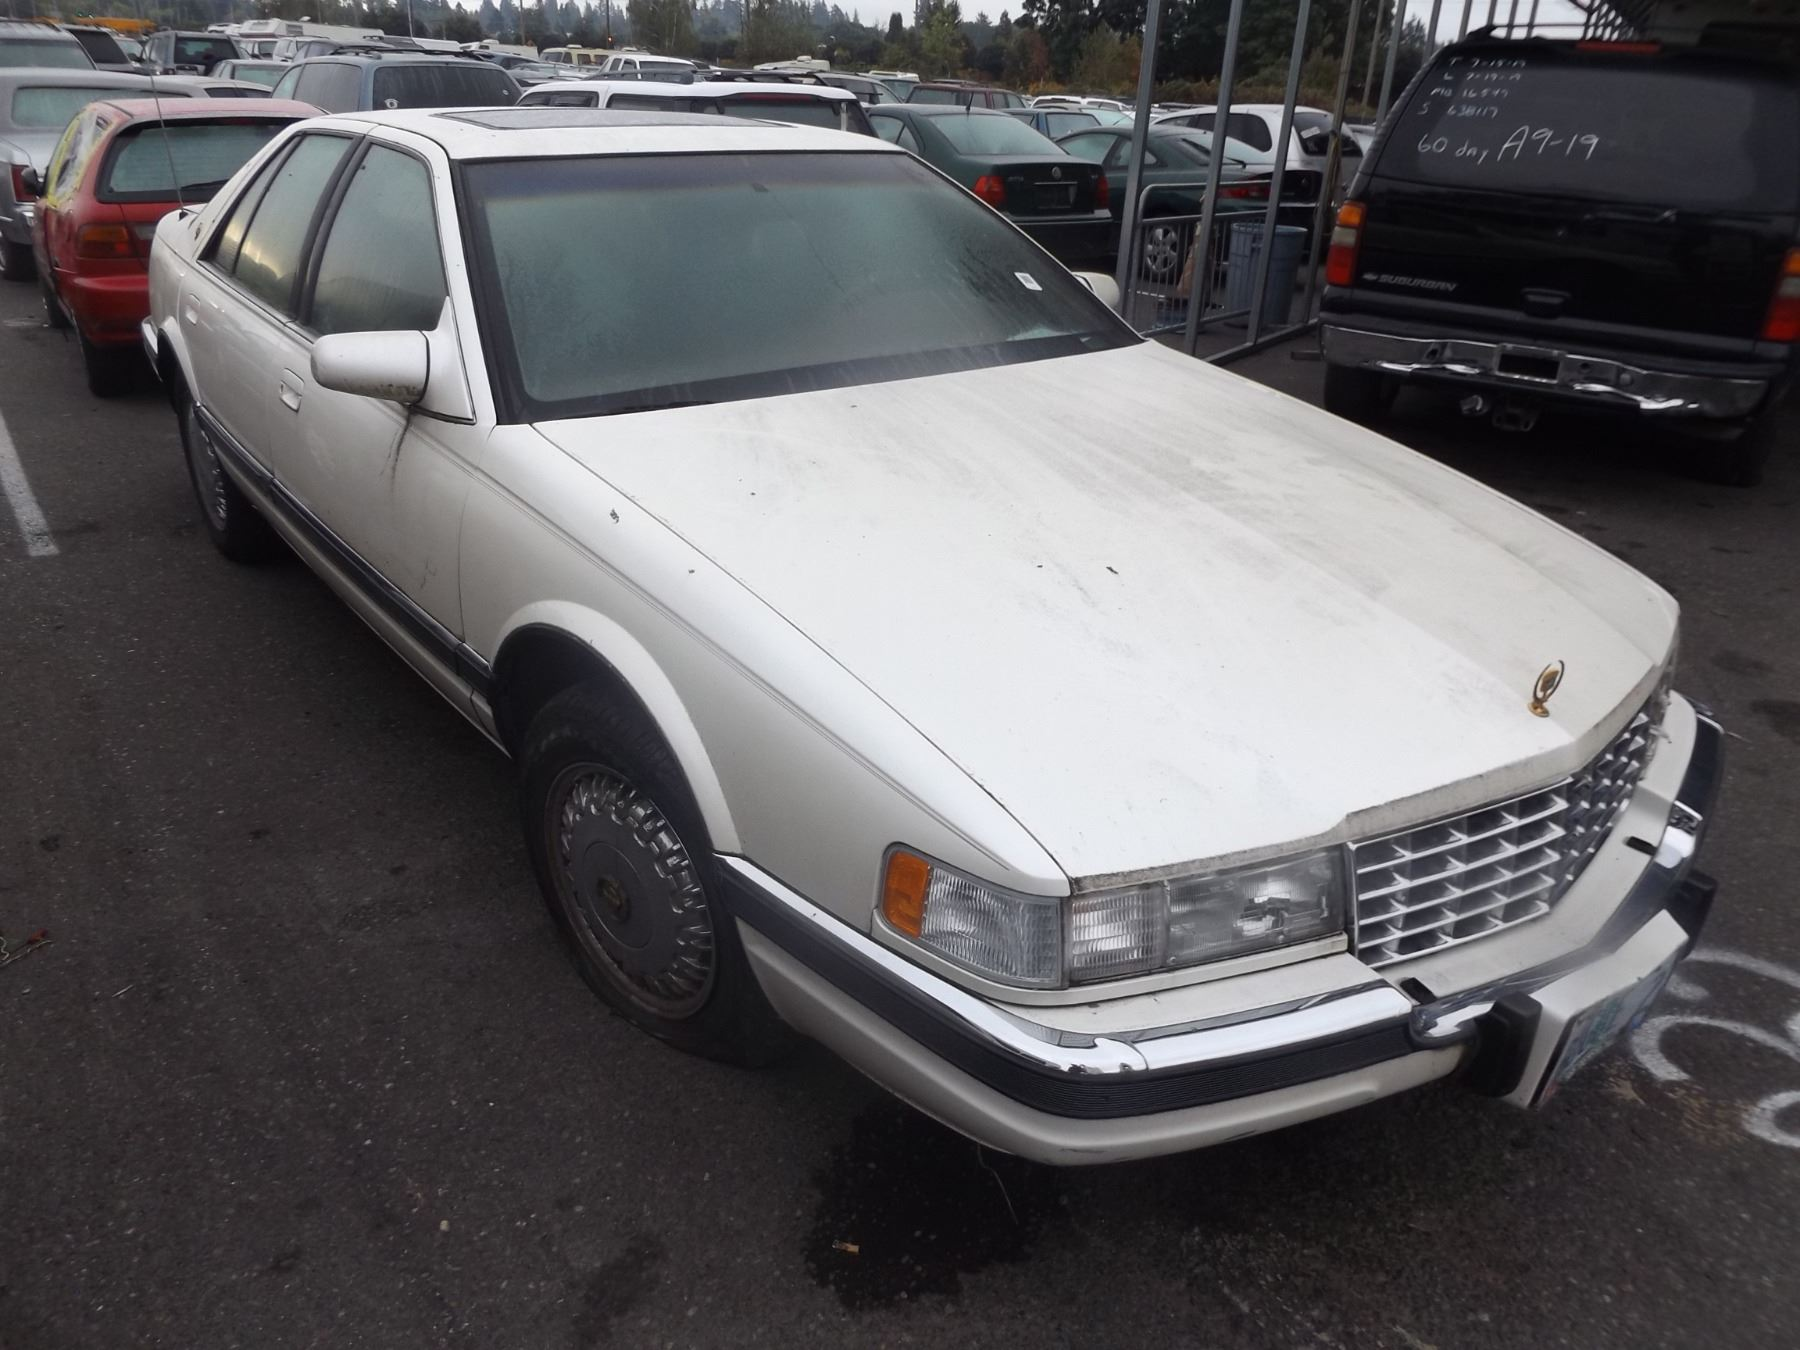 1994 Cadillac Seville - Speeds Auto Auctions